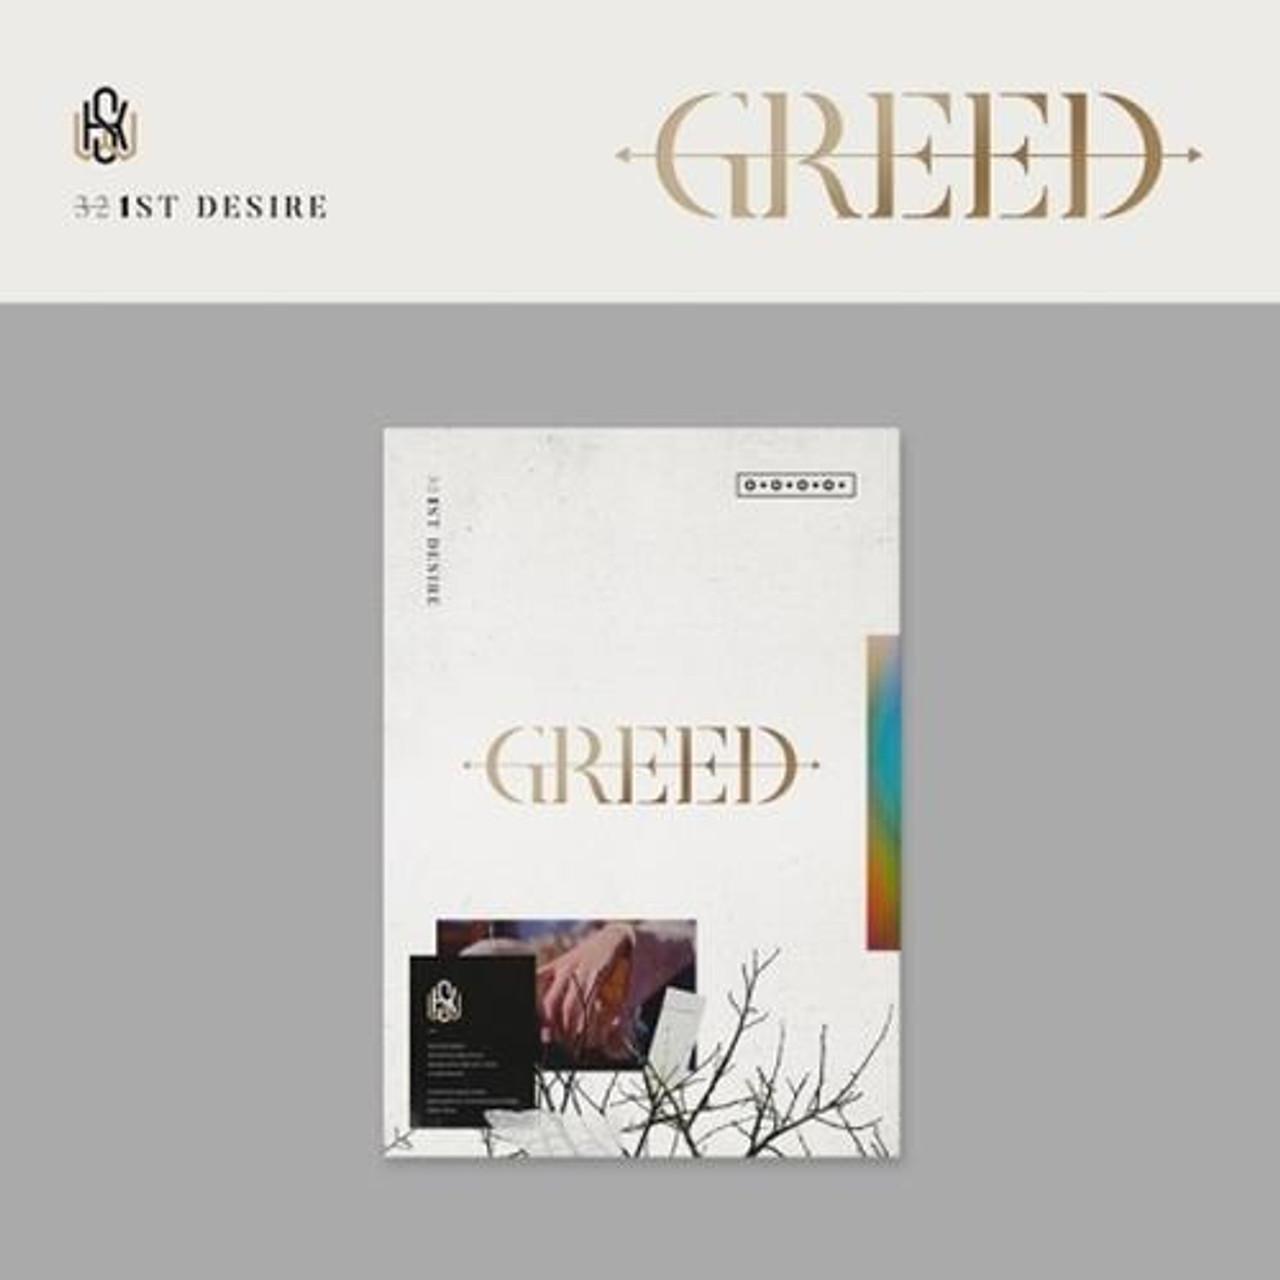 KIM WOO SEOK - 1ST DESIRE [GREED] (W VER.)+ Poster